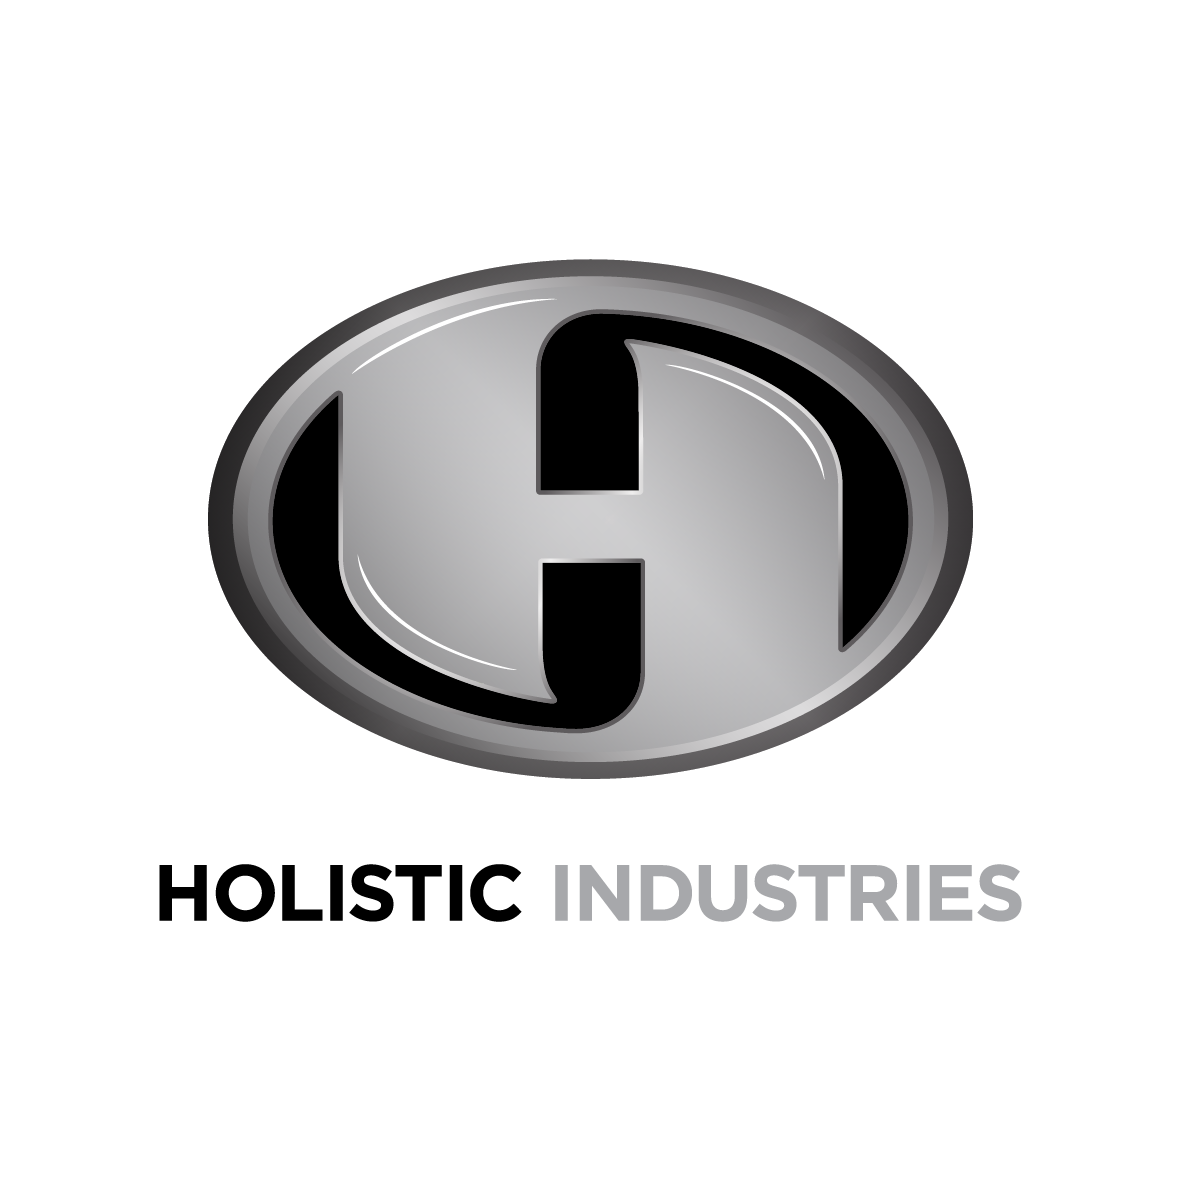 Holistic Industries